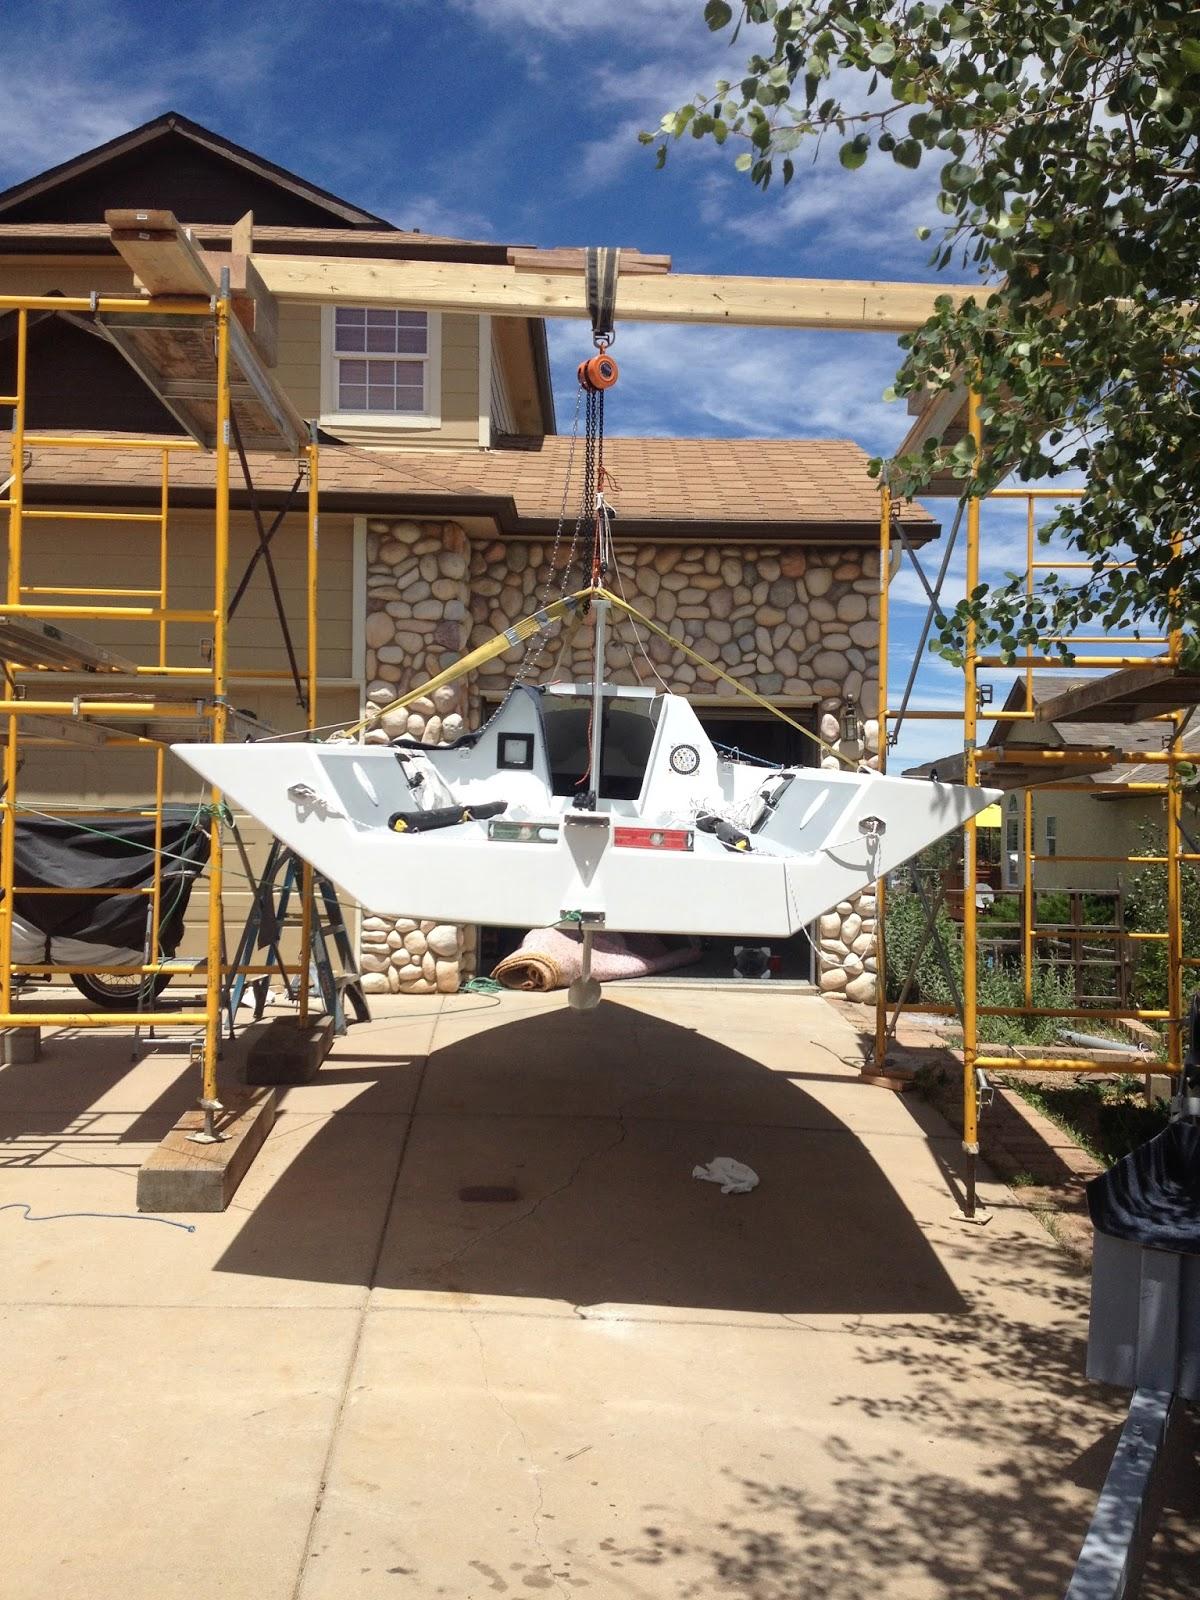 i550 #505 Sailboat build. TIME MACHINE